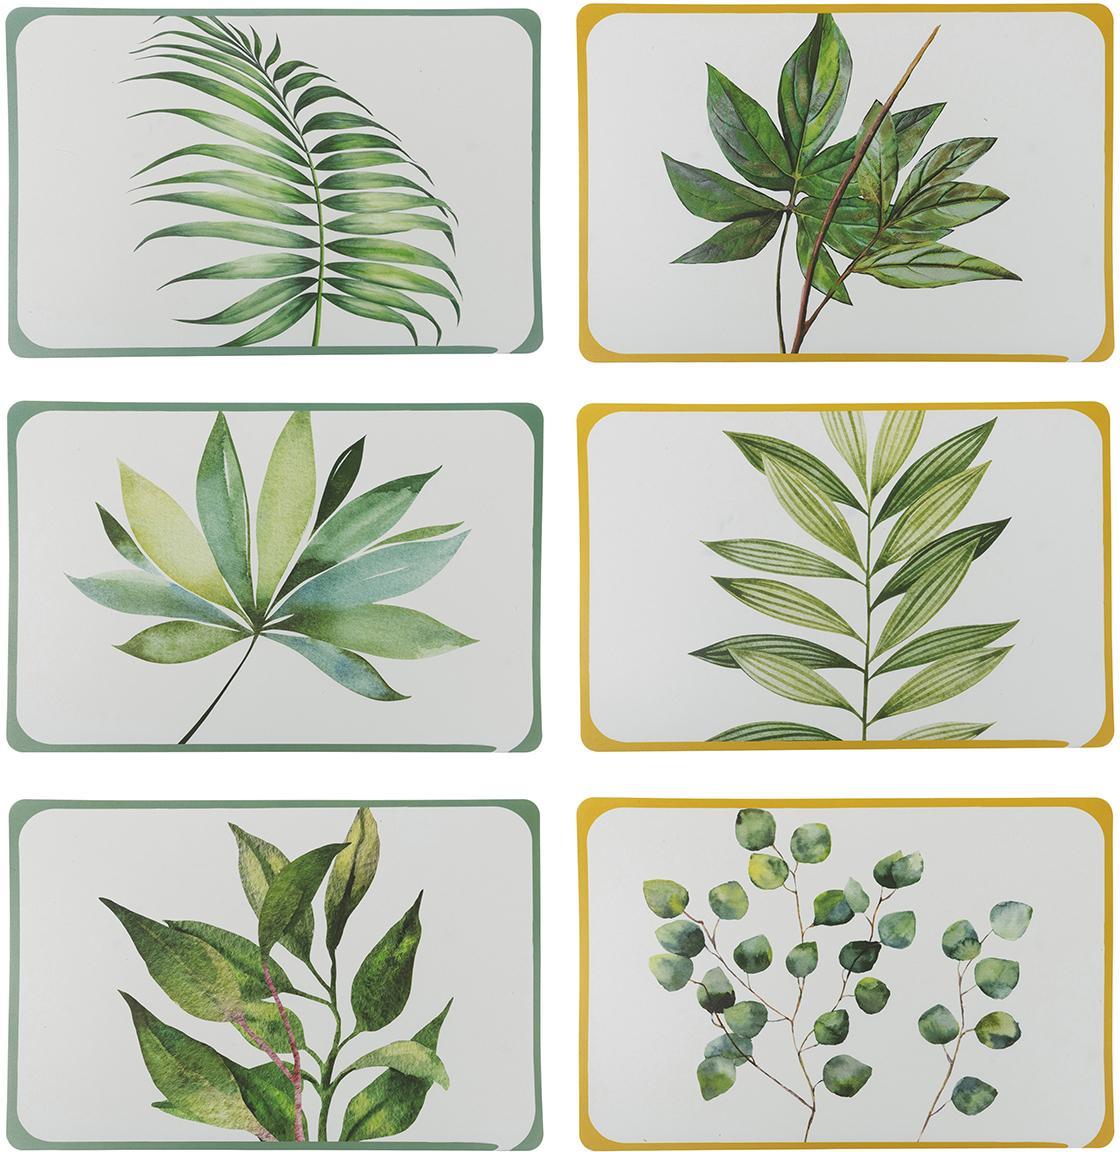 Manteles individuales Botanique, 6uds., Plástico, Blanco, verde, amarillo, An 45 x F 30 cm